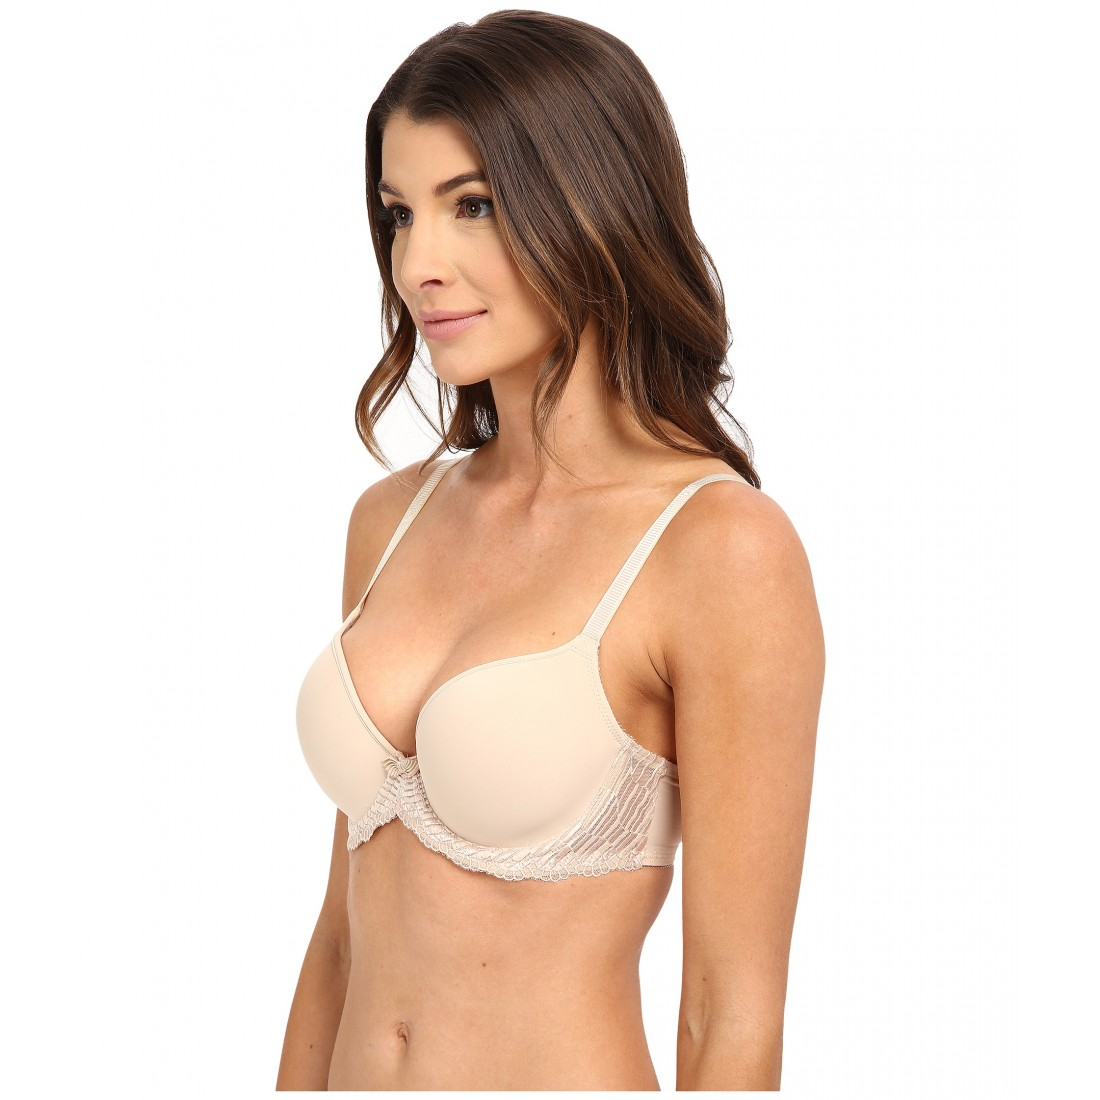 a5cdd47fa18 Wacoal La Femme Contour Underwire Bra 853117 ZPSKU 8162021 Natural Nude